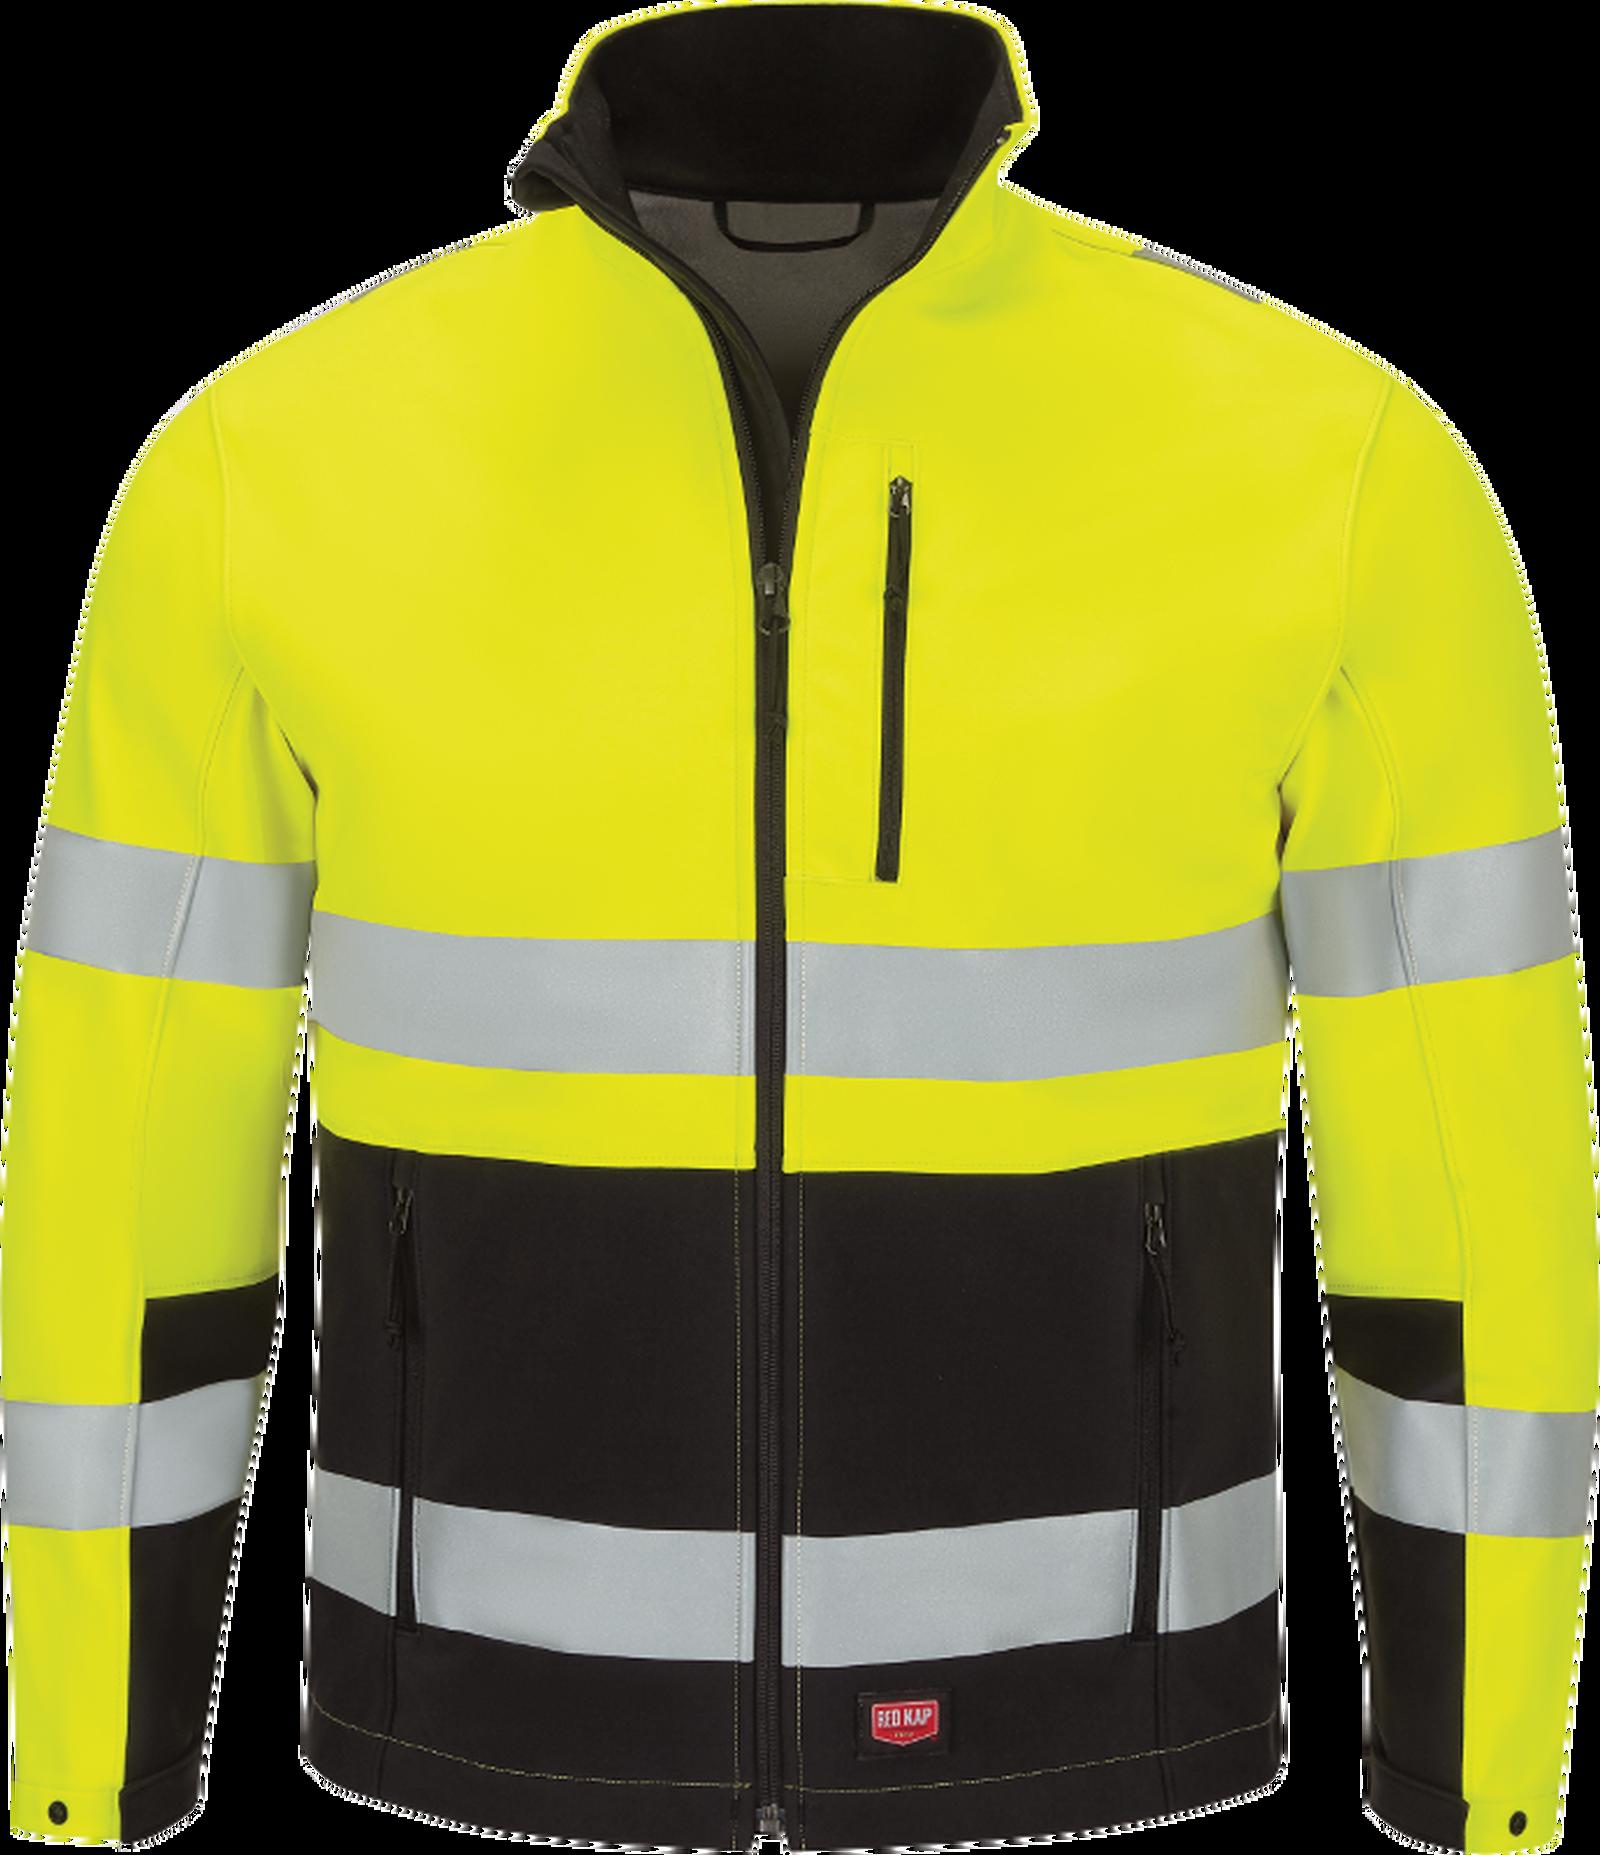 Men's Hi-Visibility Soft Shell Jacket